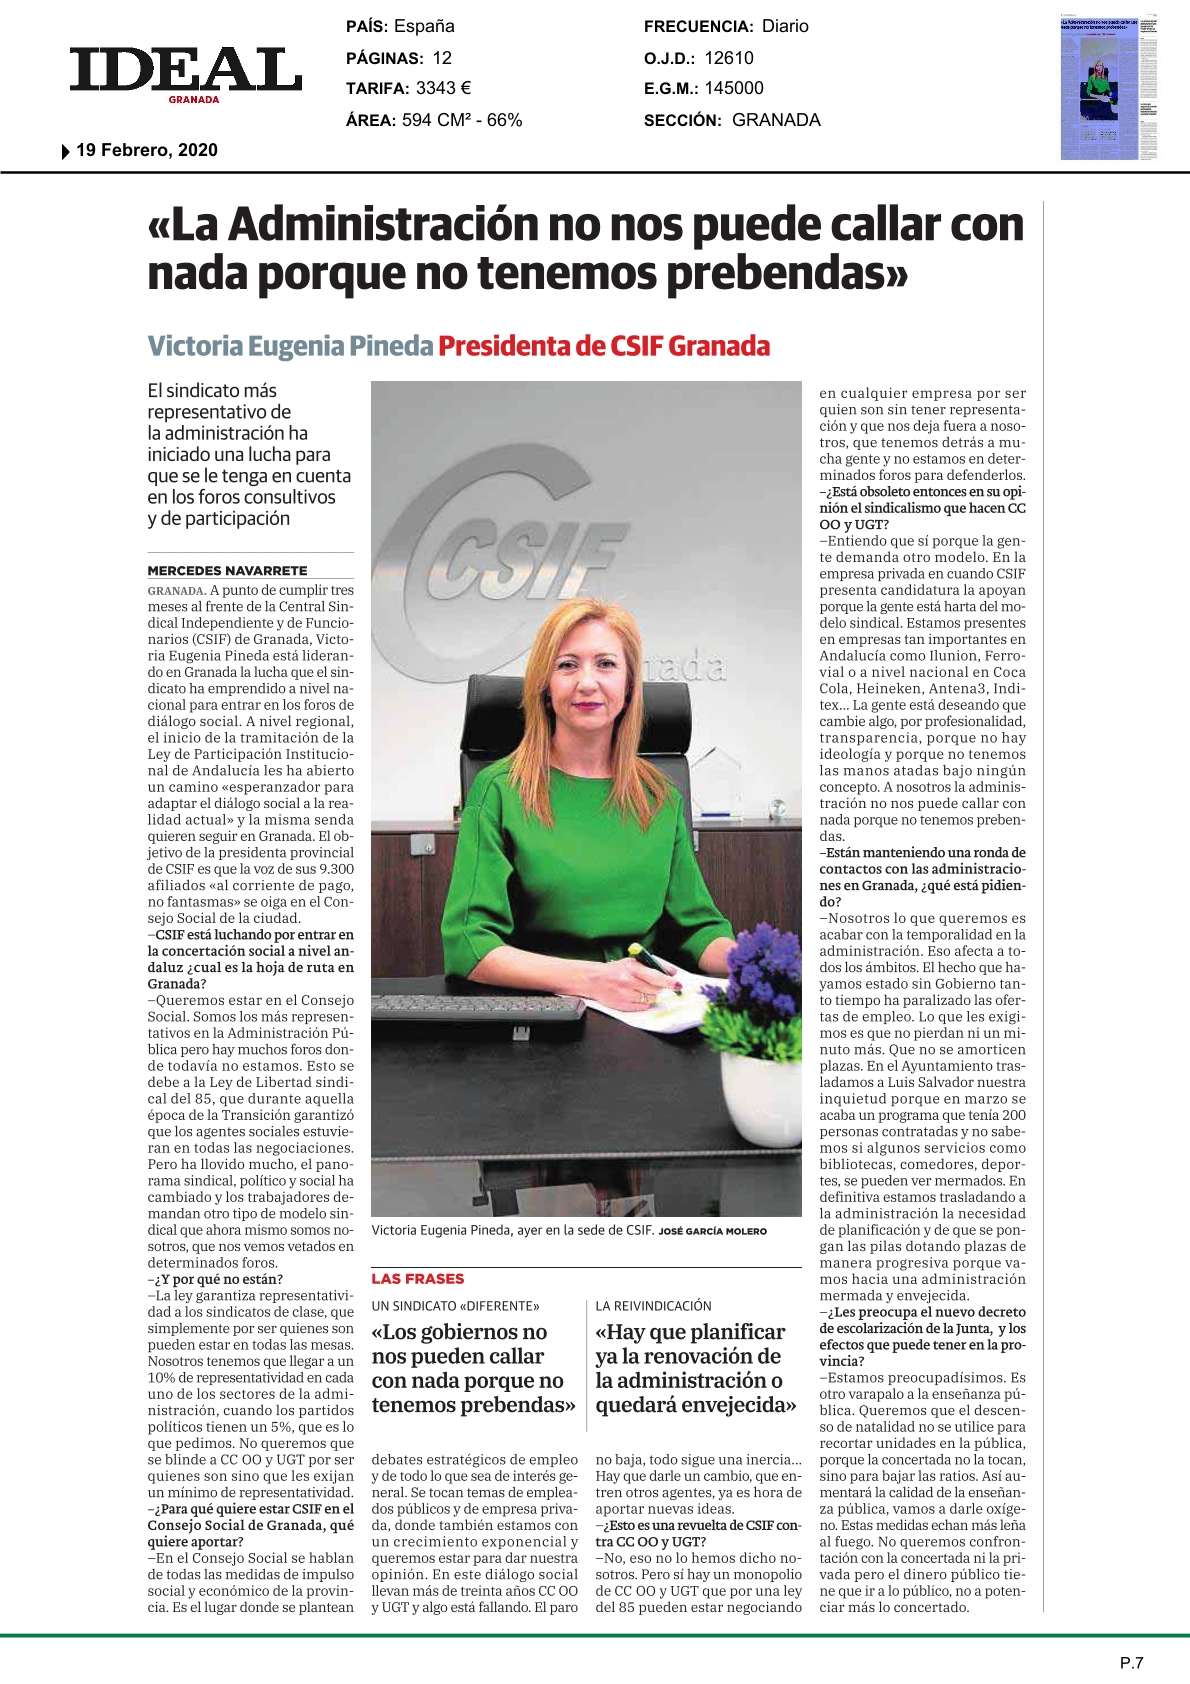 Entrevista presidenta CSIF Granada en IDEAL 19/2/2020